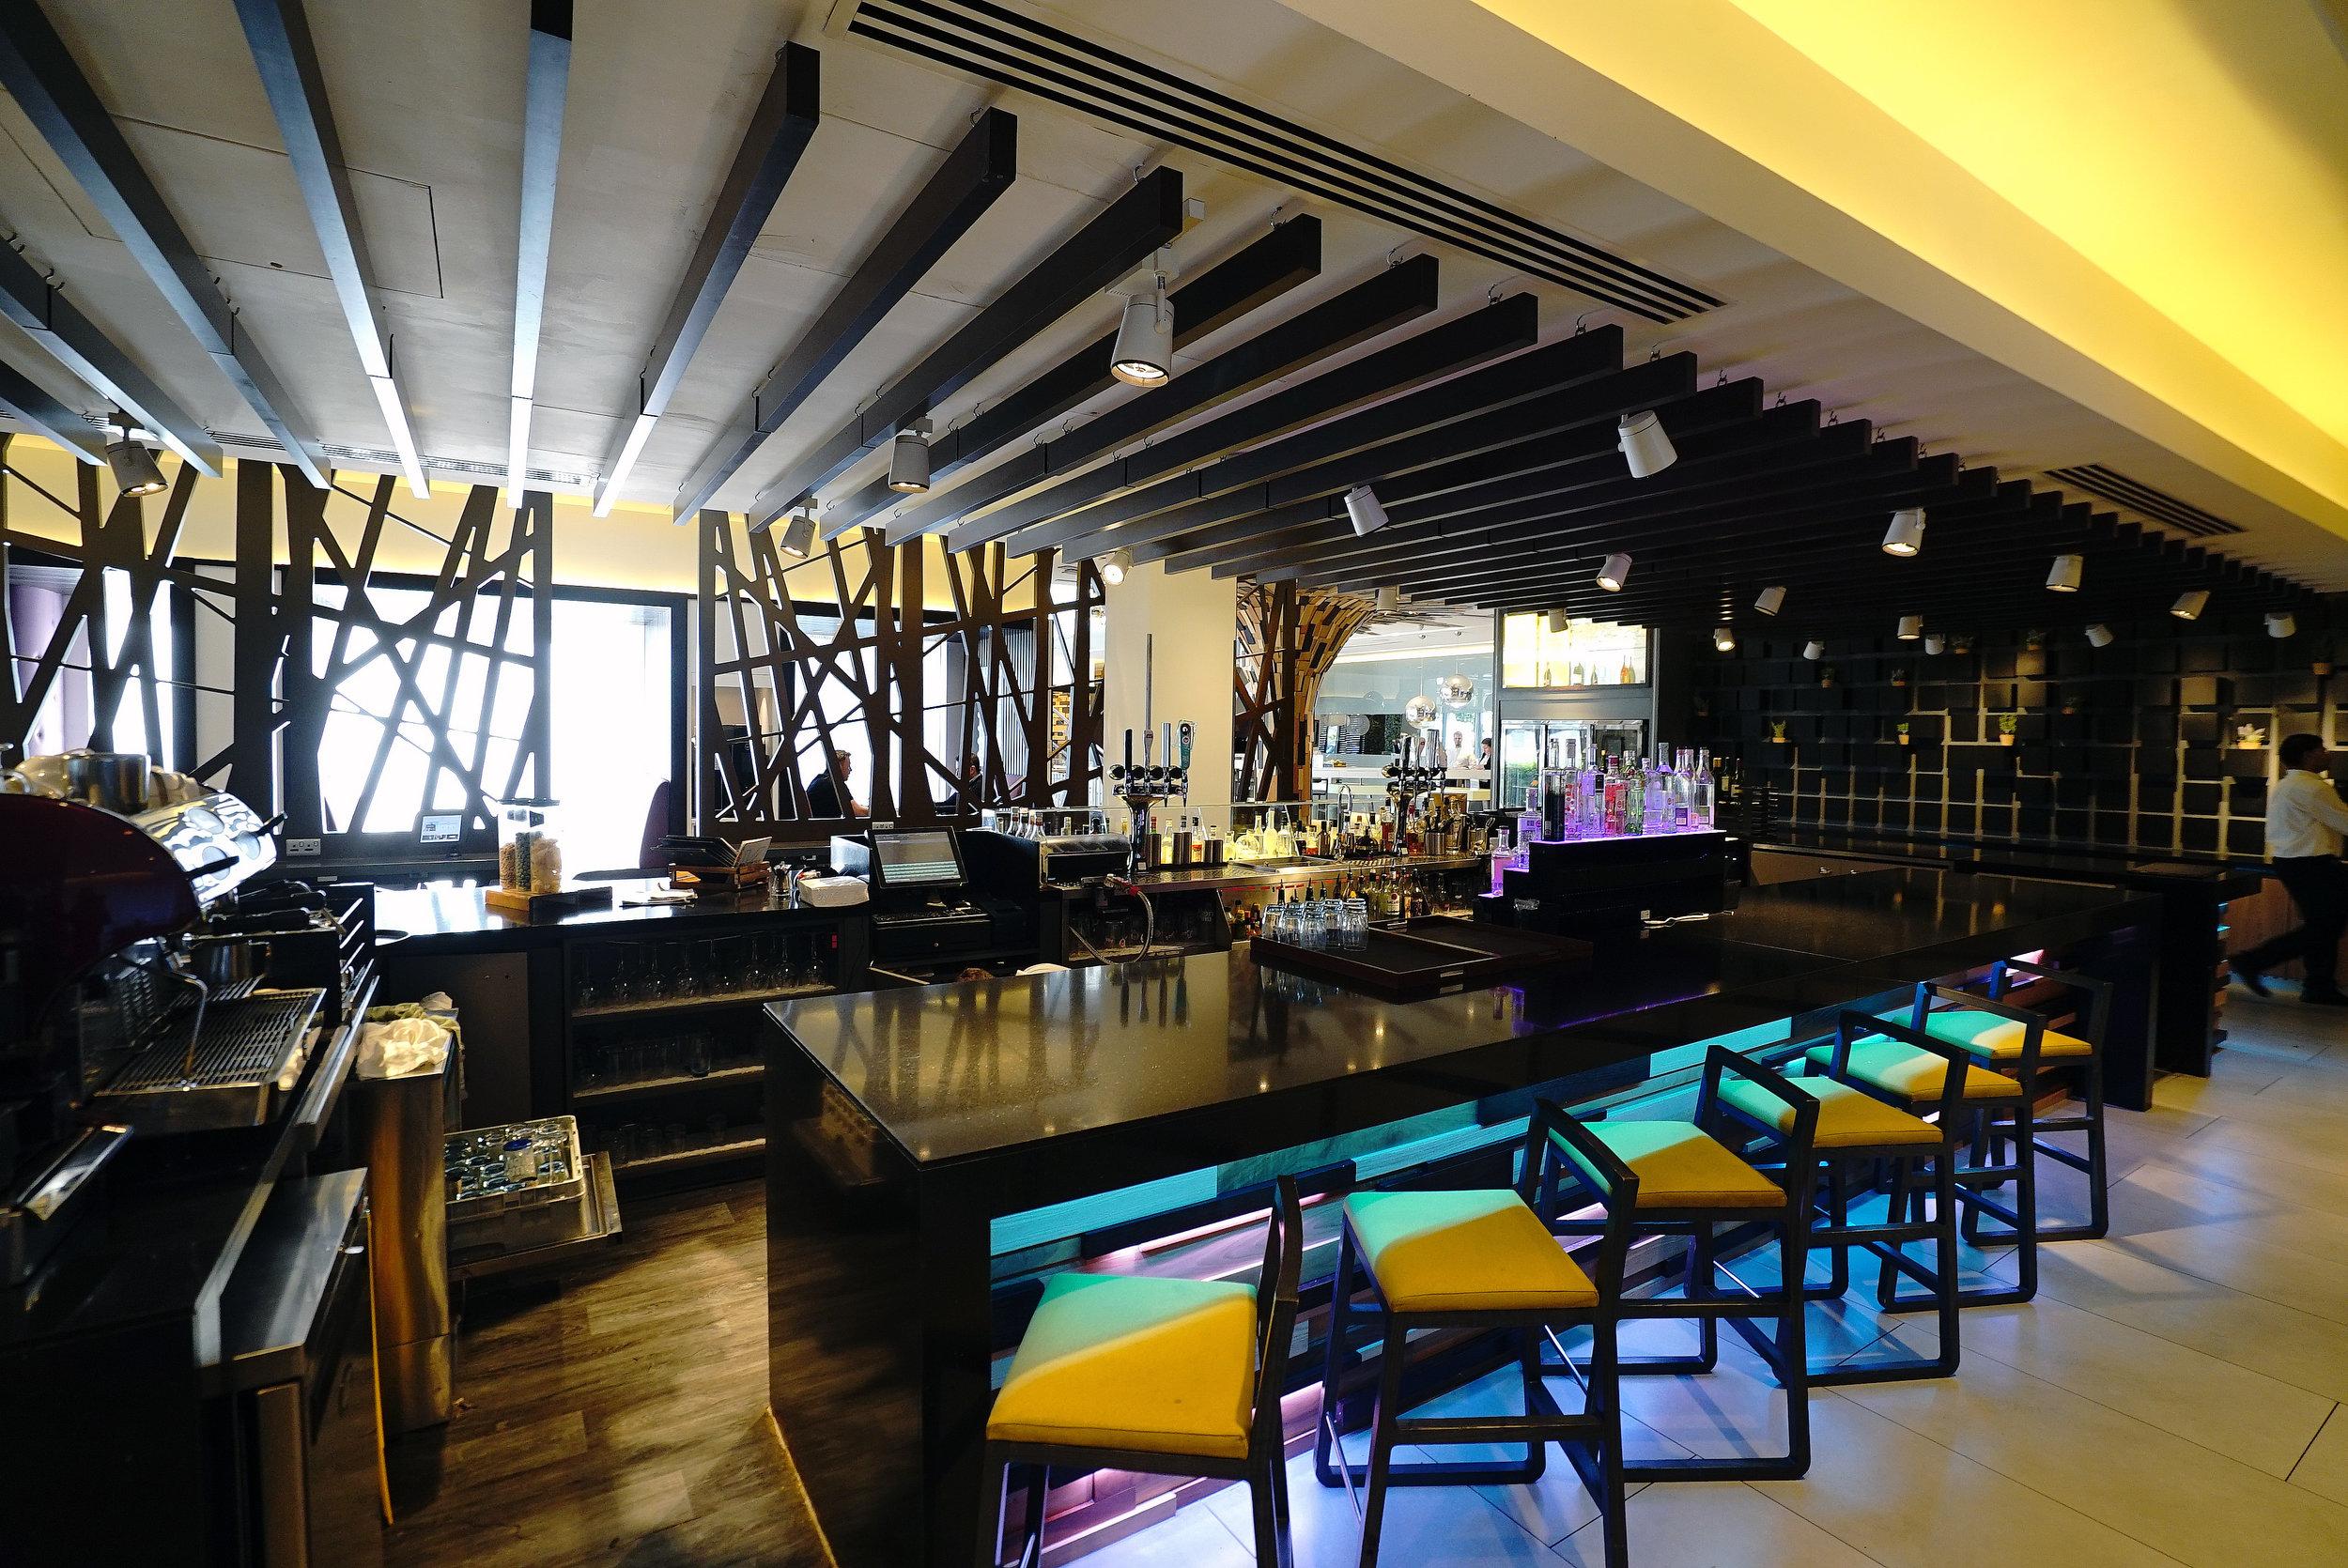 Novotel Brentford Hotel Bar L.jpg